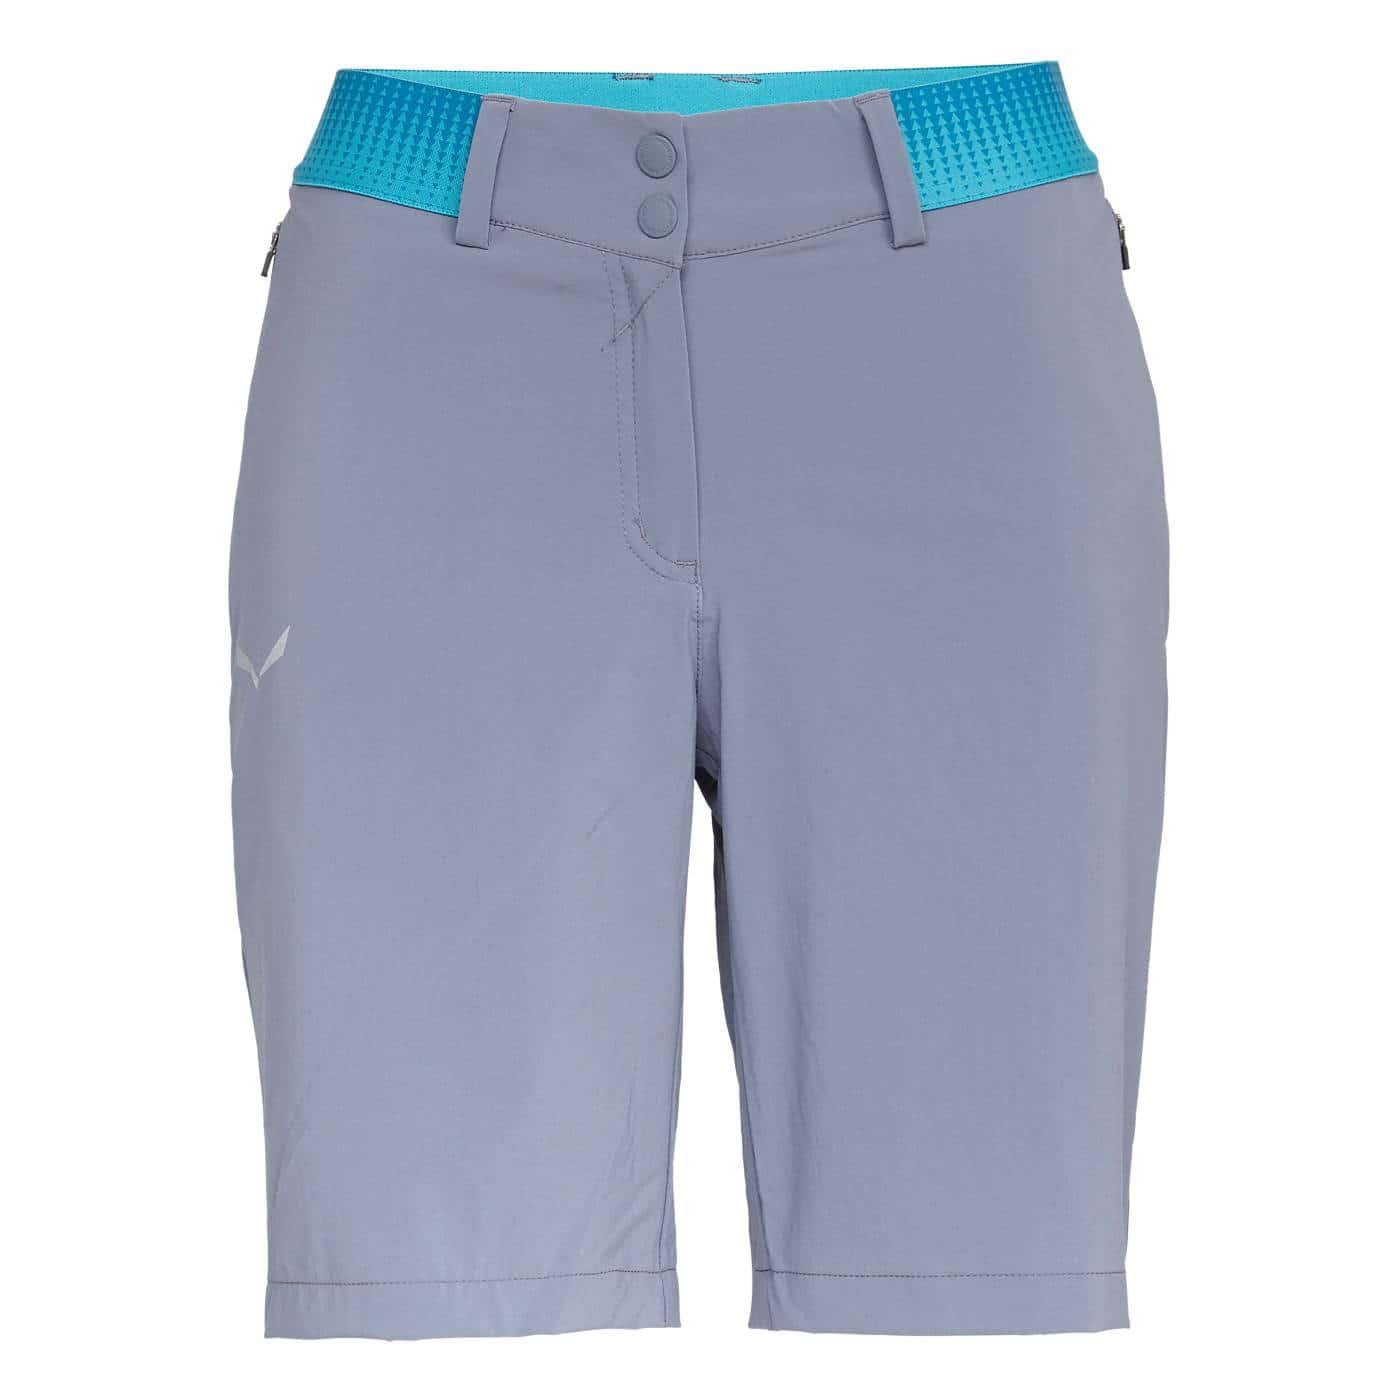 Salewa-Pedroc Cargo 2 DST Shorts - Women's